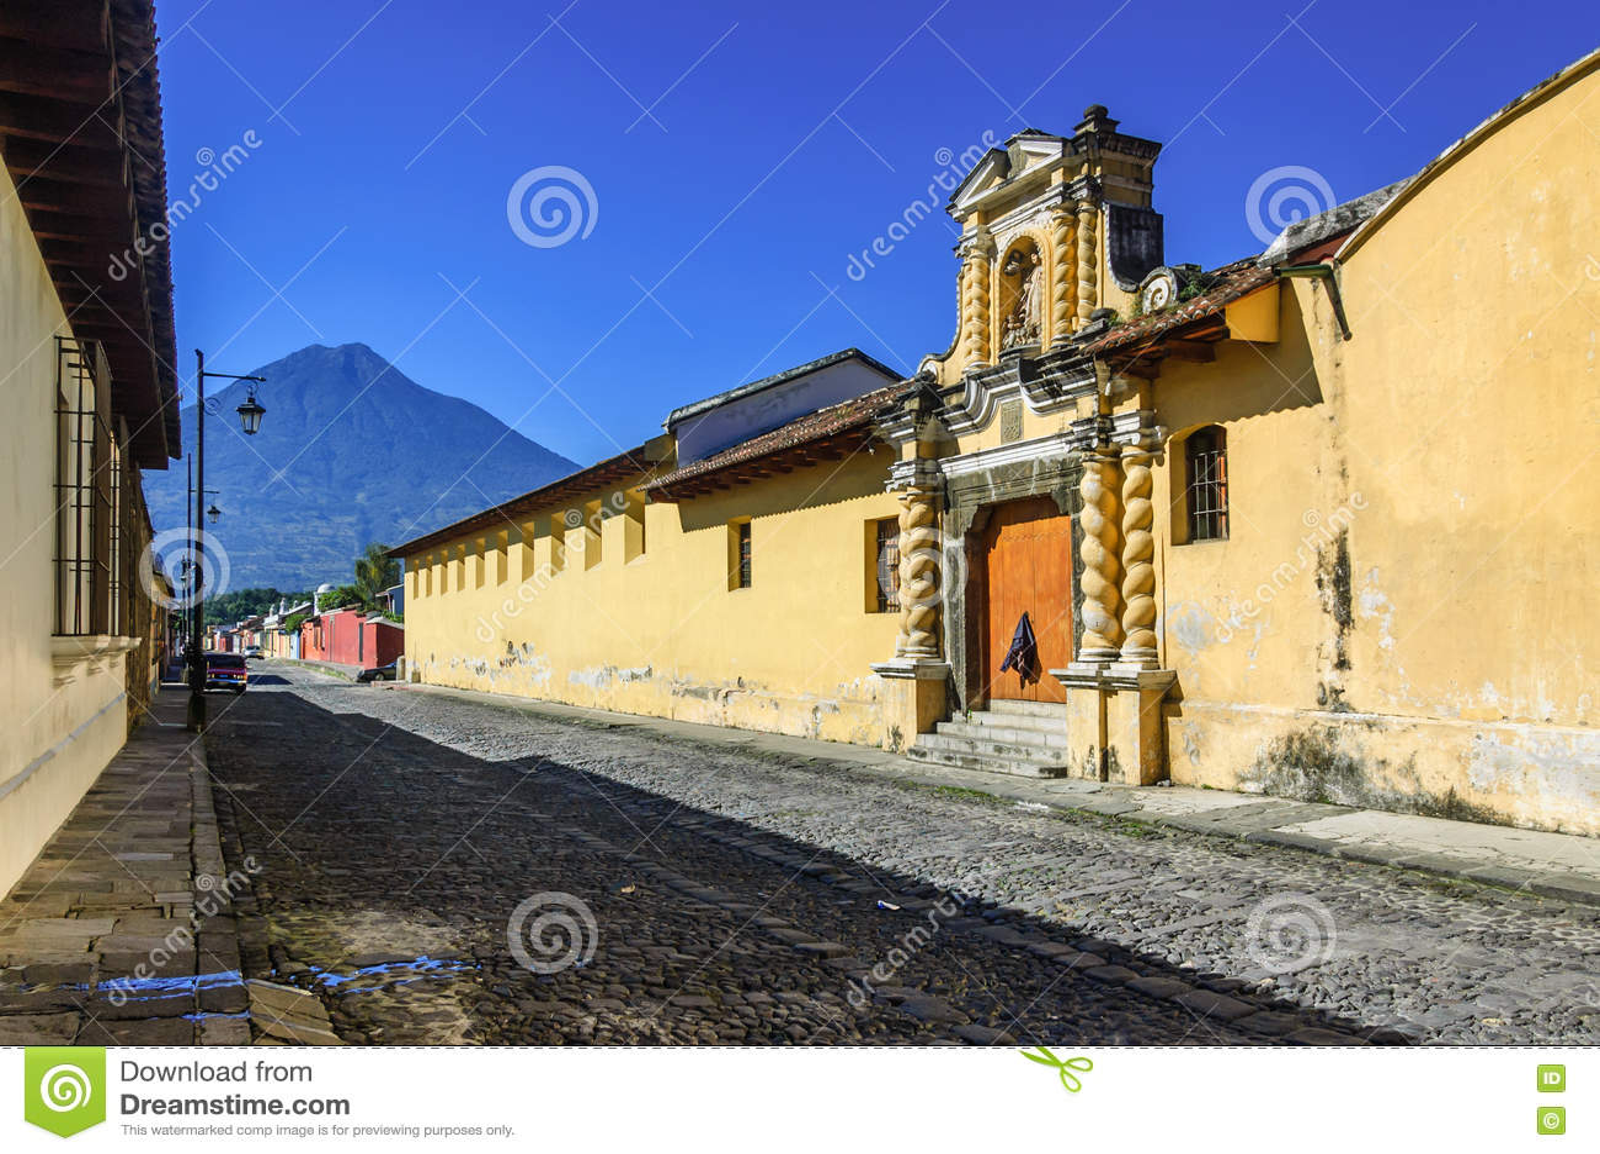 Aguavulkan u. Kopfsteinstraße, Antigua, Guatemala